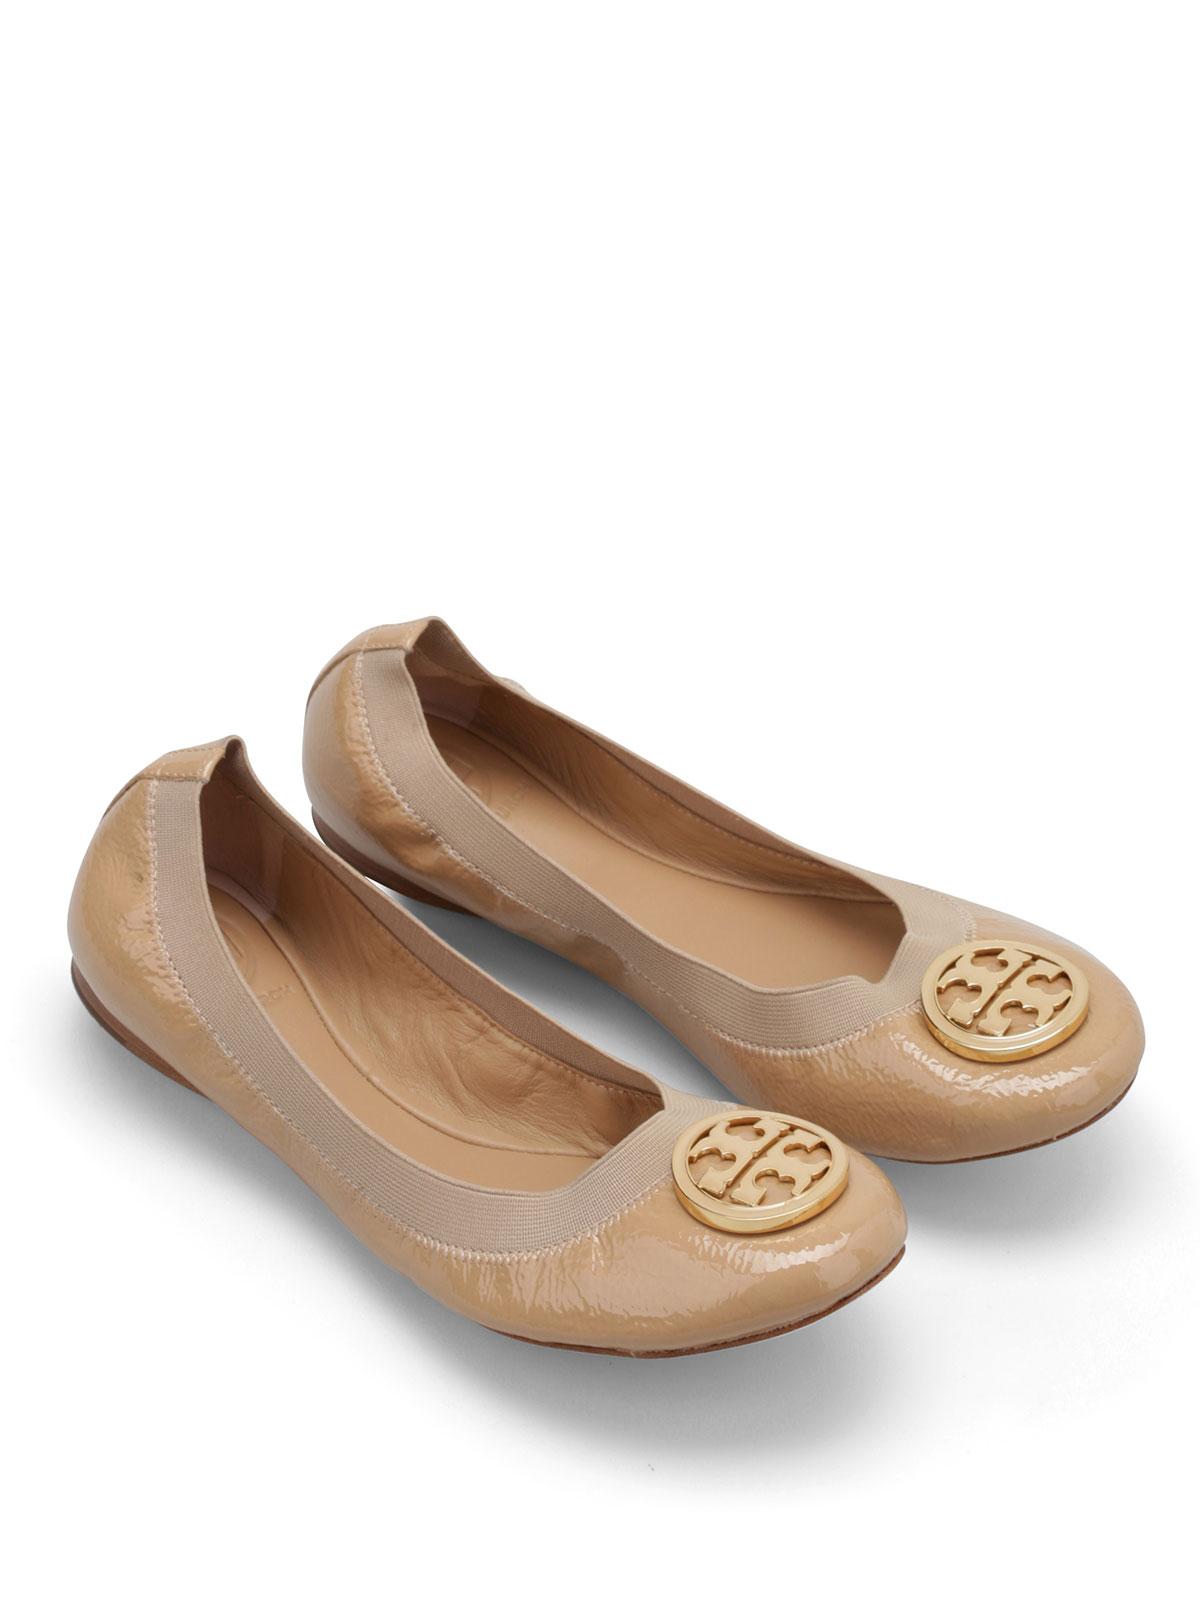 Tory Burch: flat shoes - Caroline Naplak flats